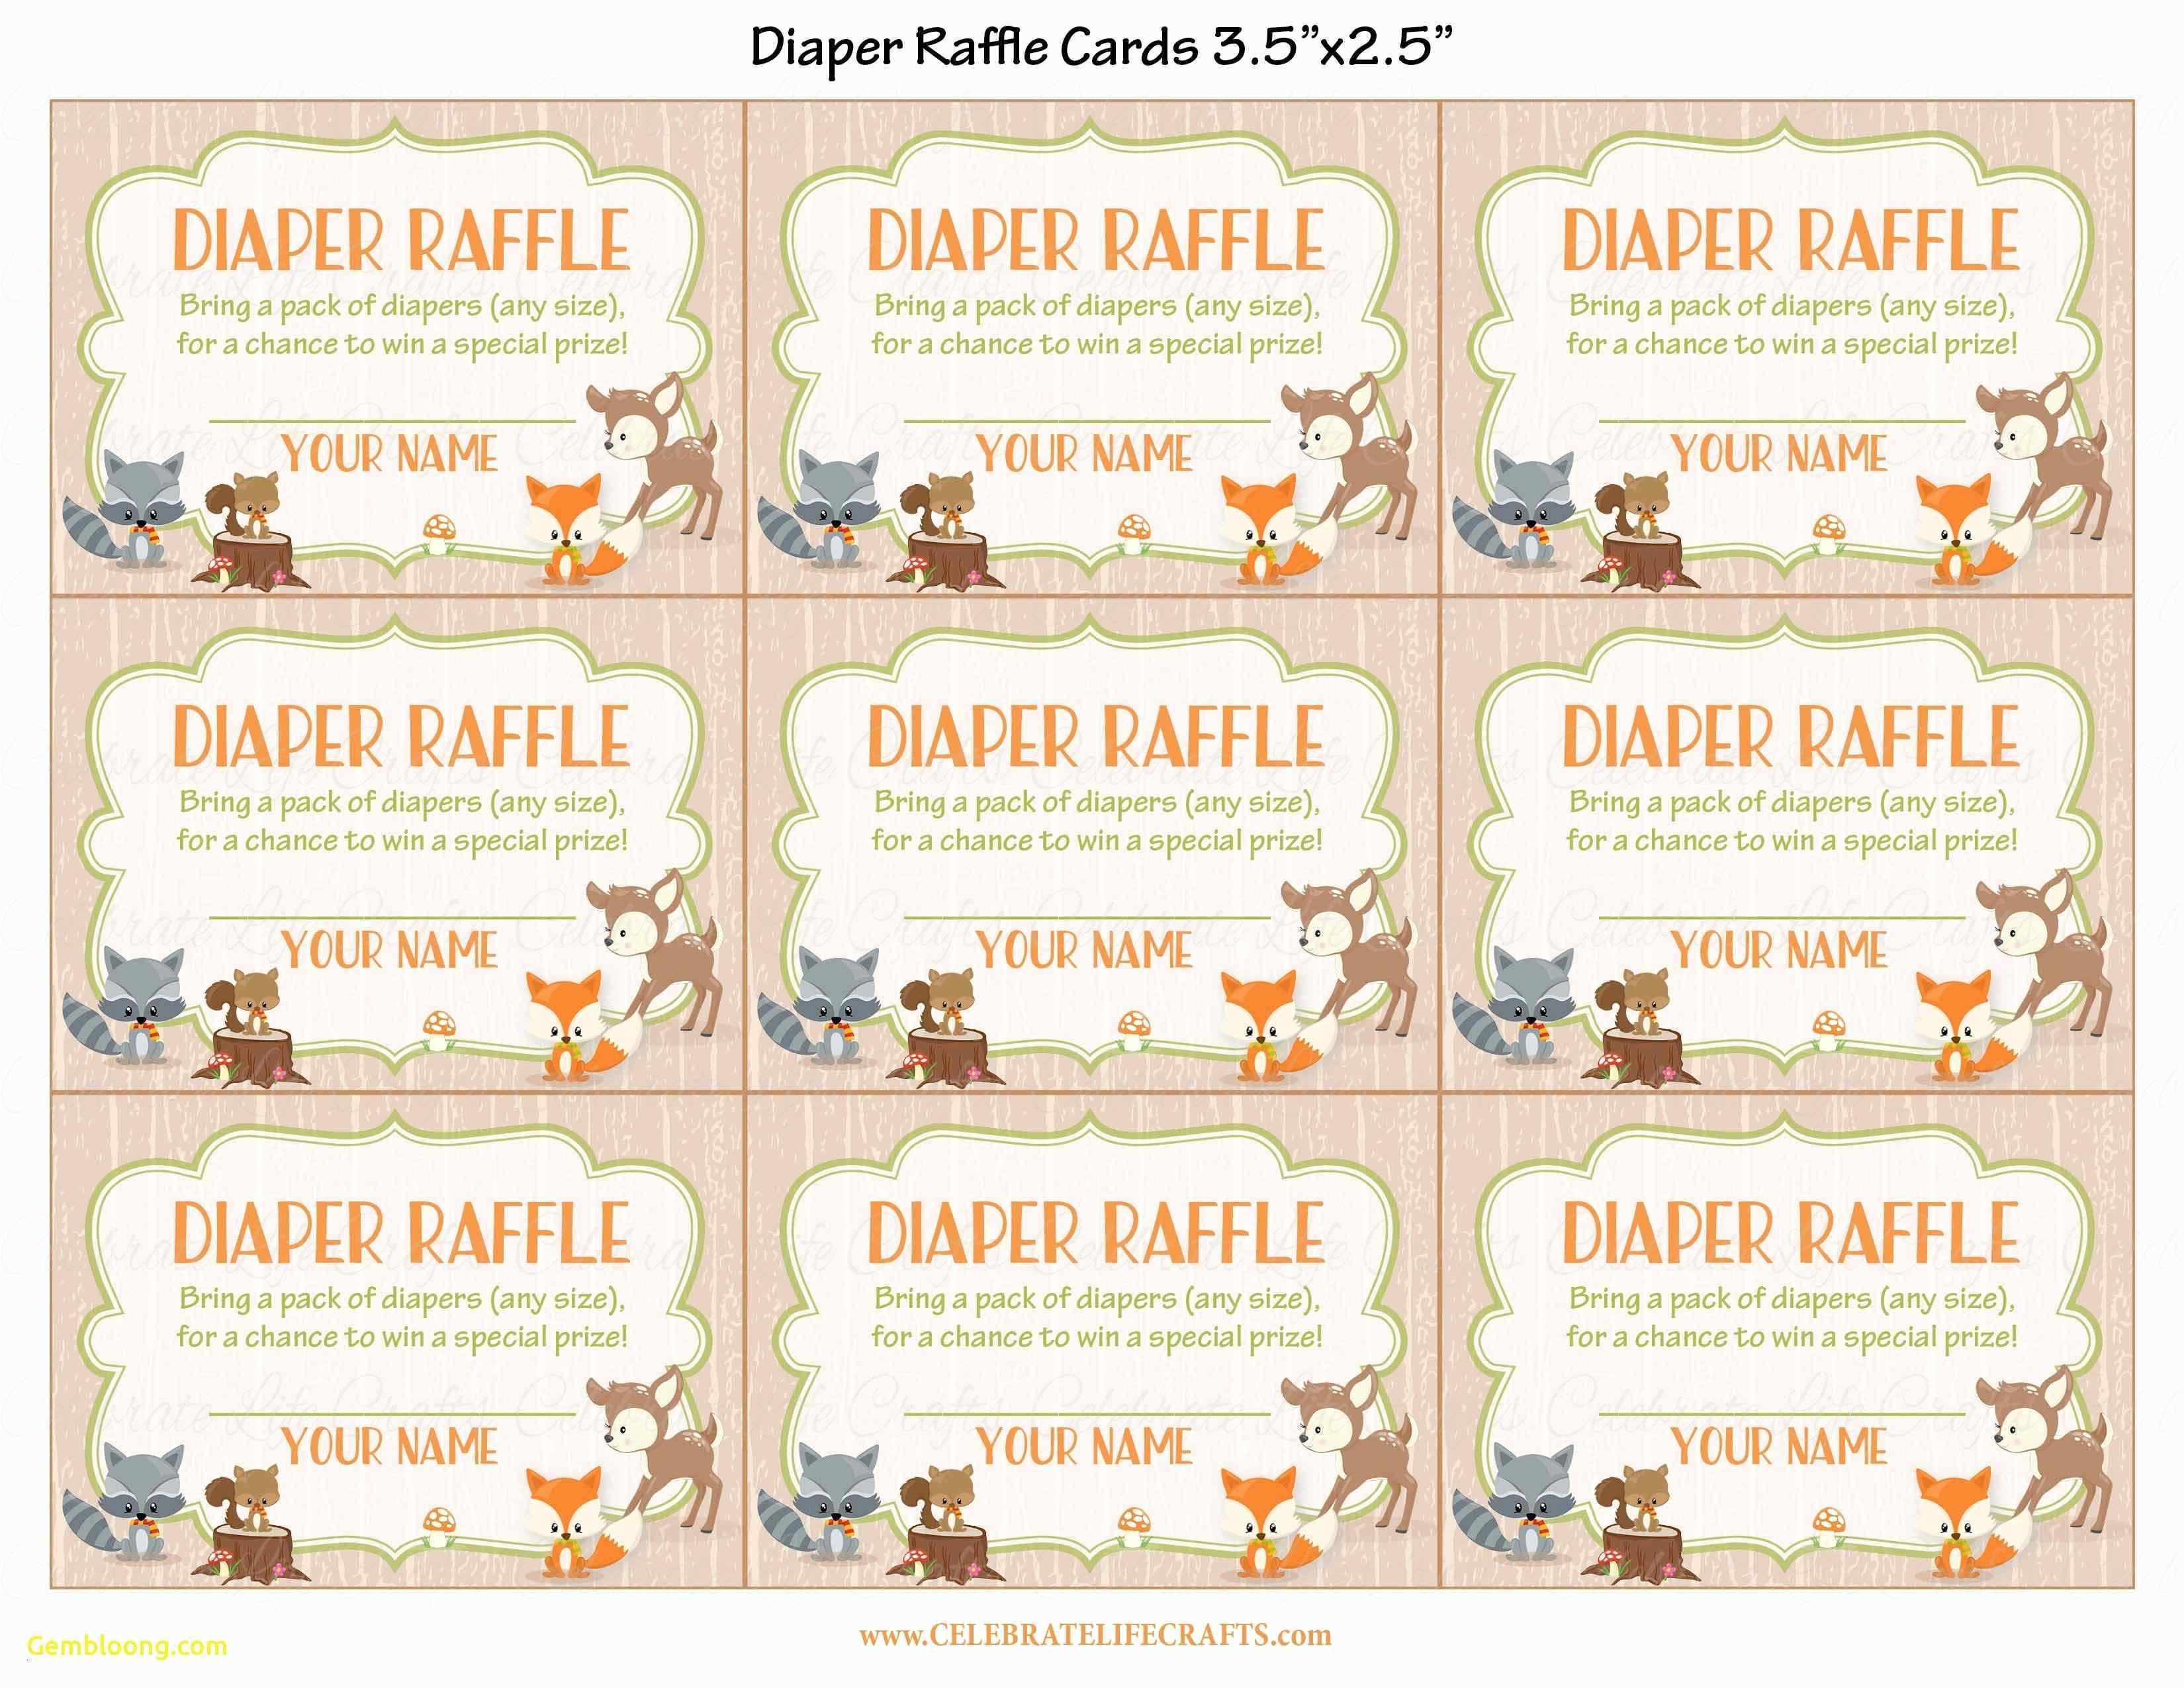 013 Diaper Raffle Tickets Template Elegant Luxury Baby Shower - Free Printable Baby Shower Diaper Raffle Tickets